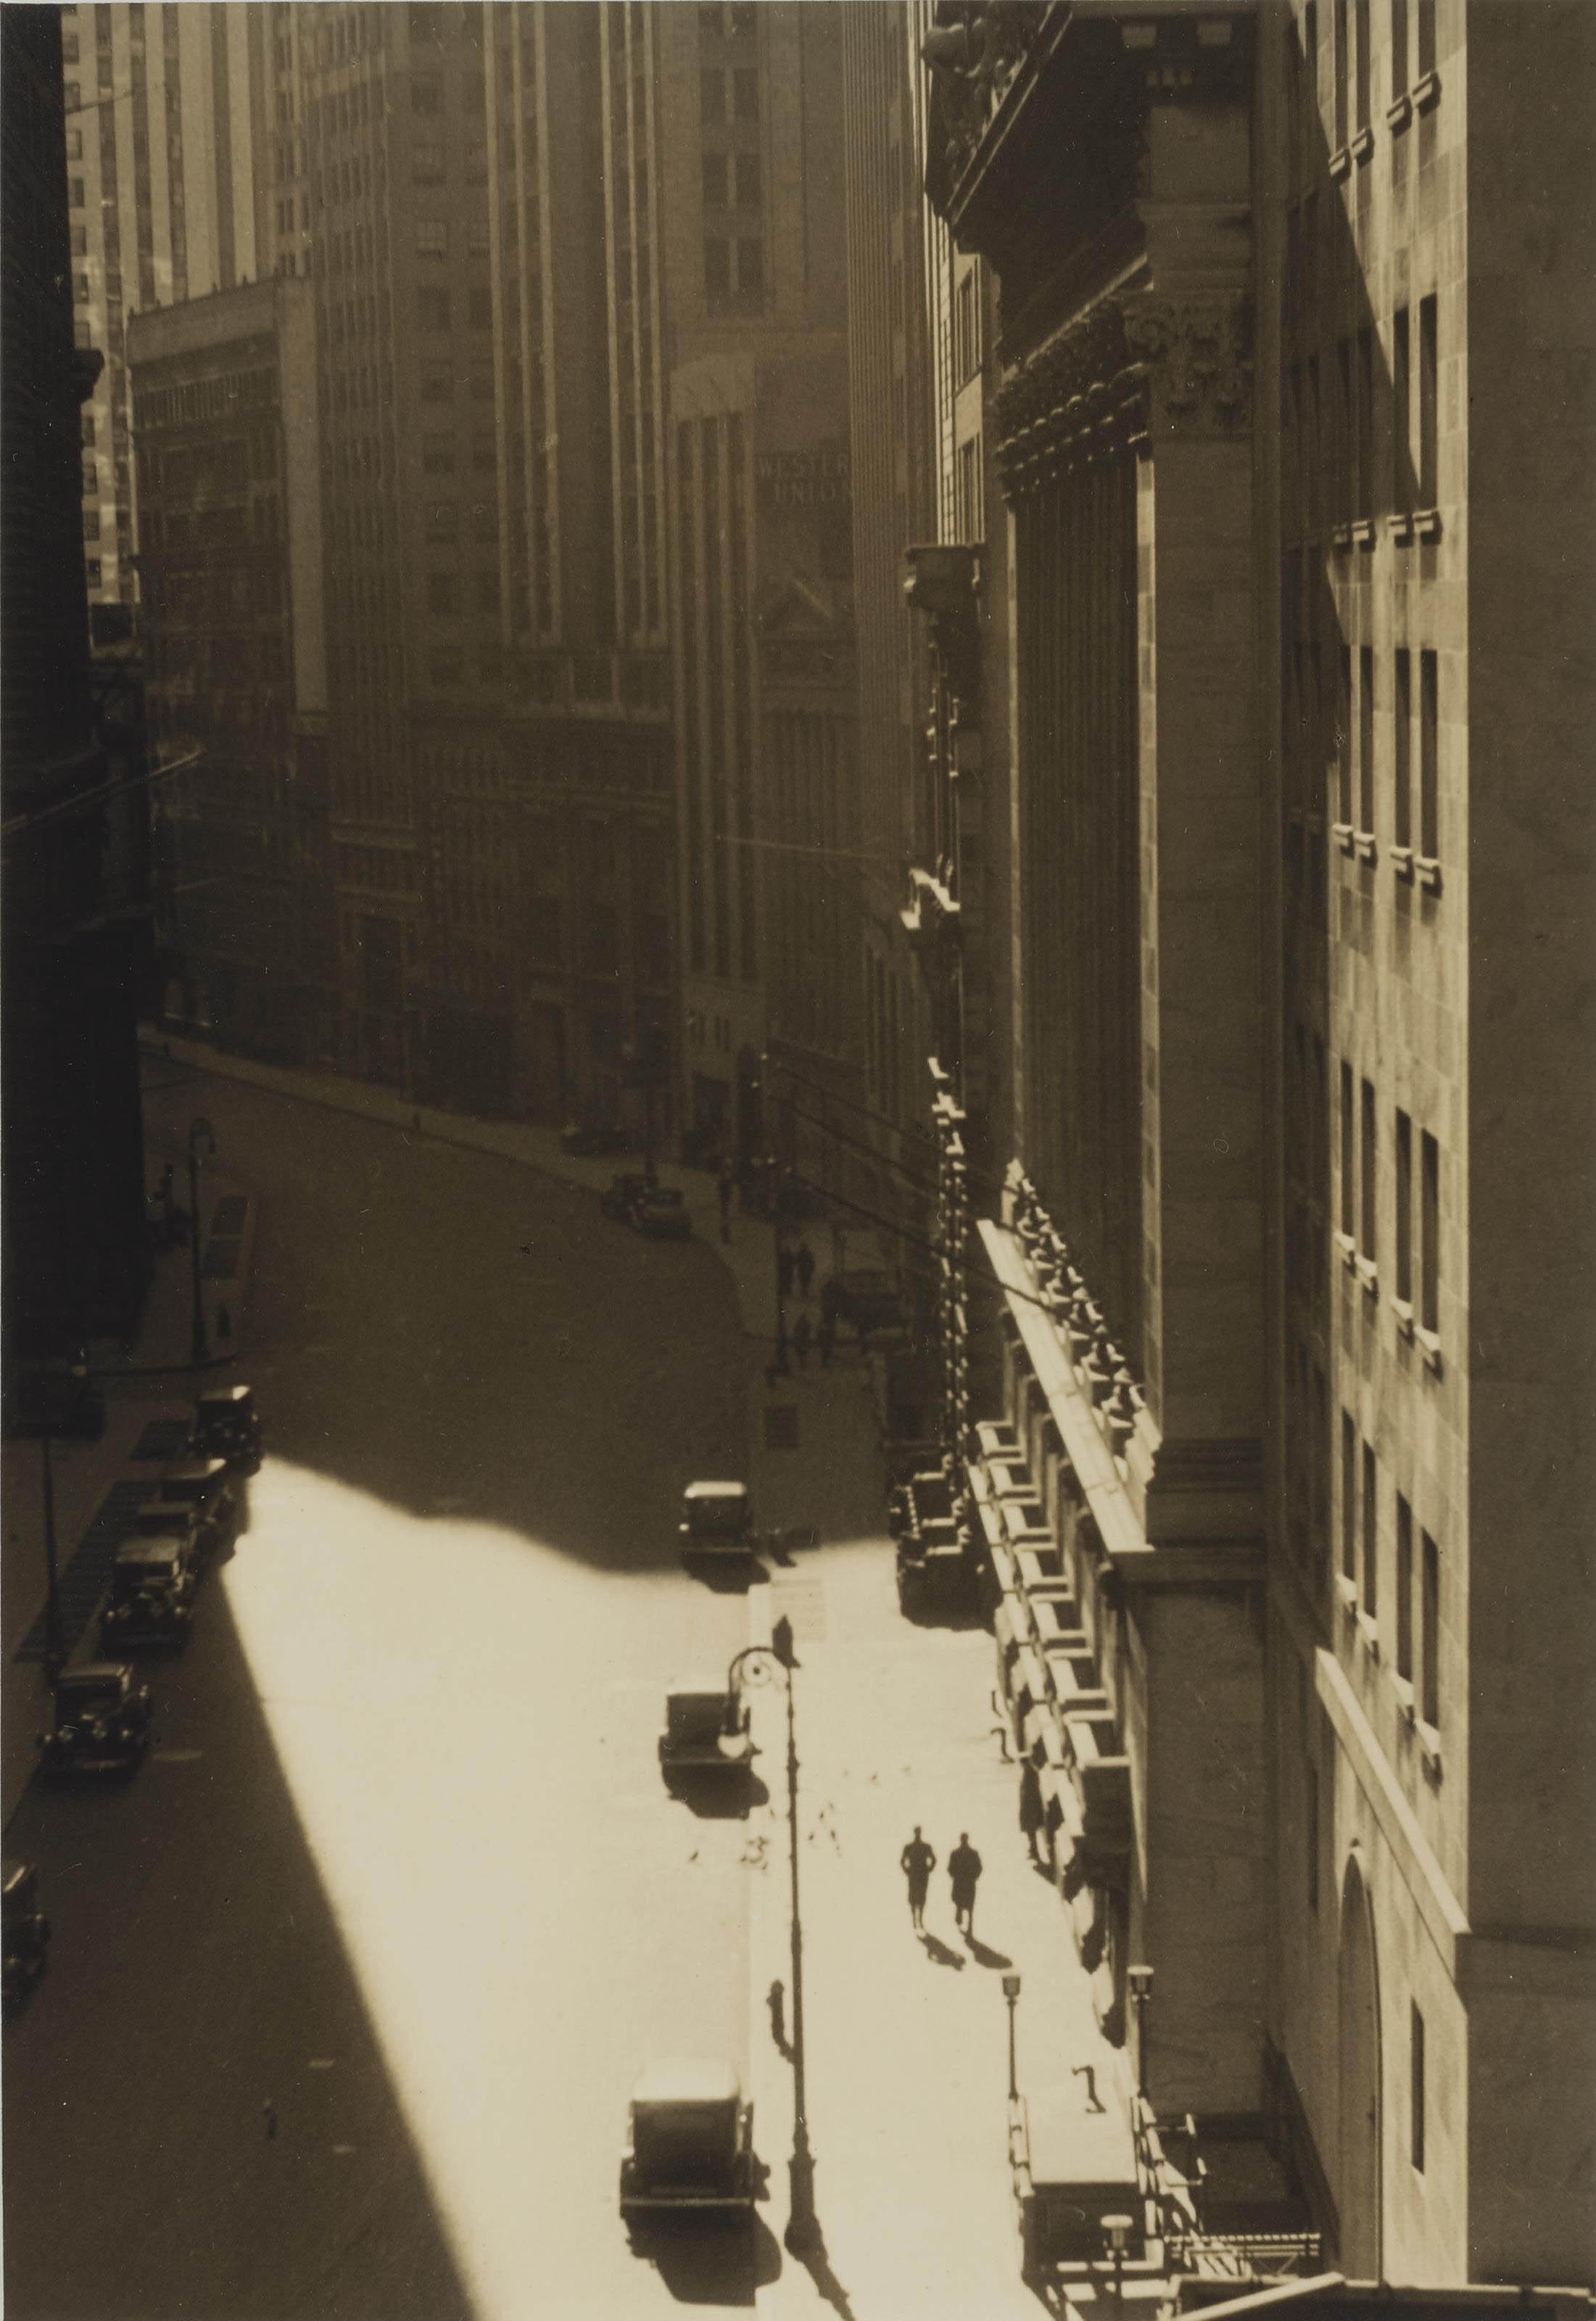 Exchange Place, c. 1930